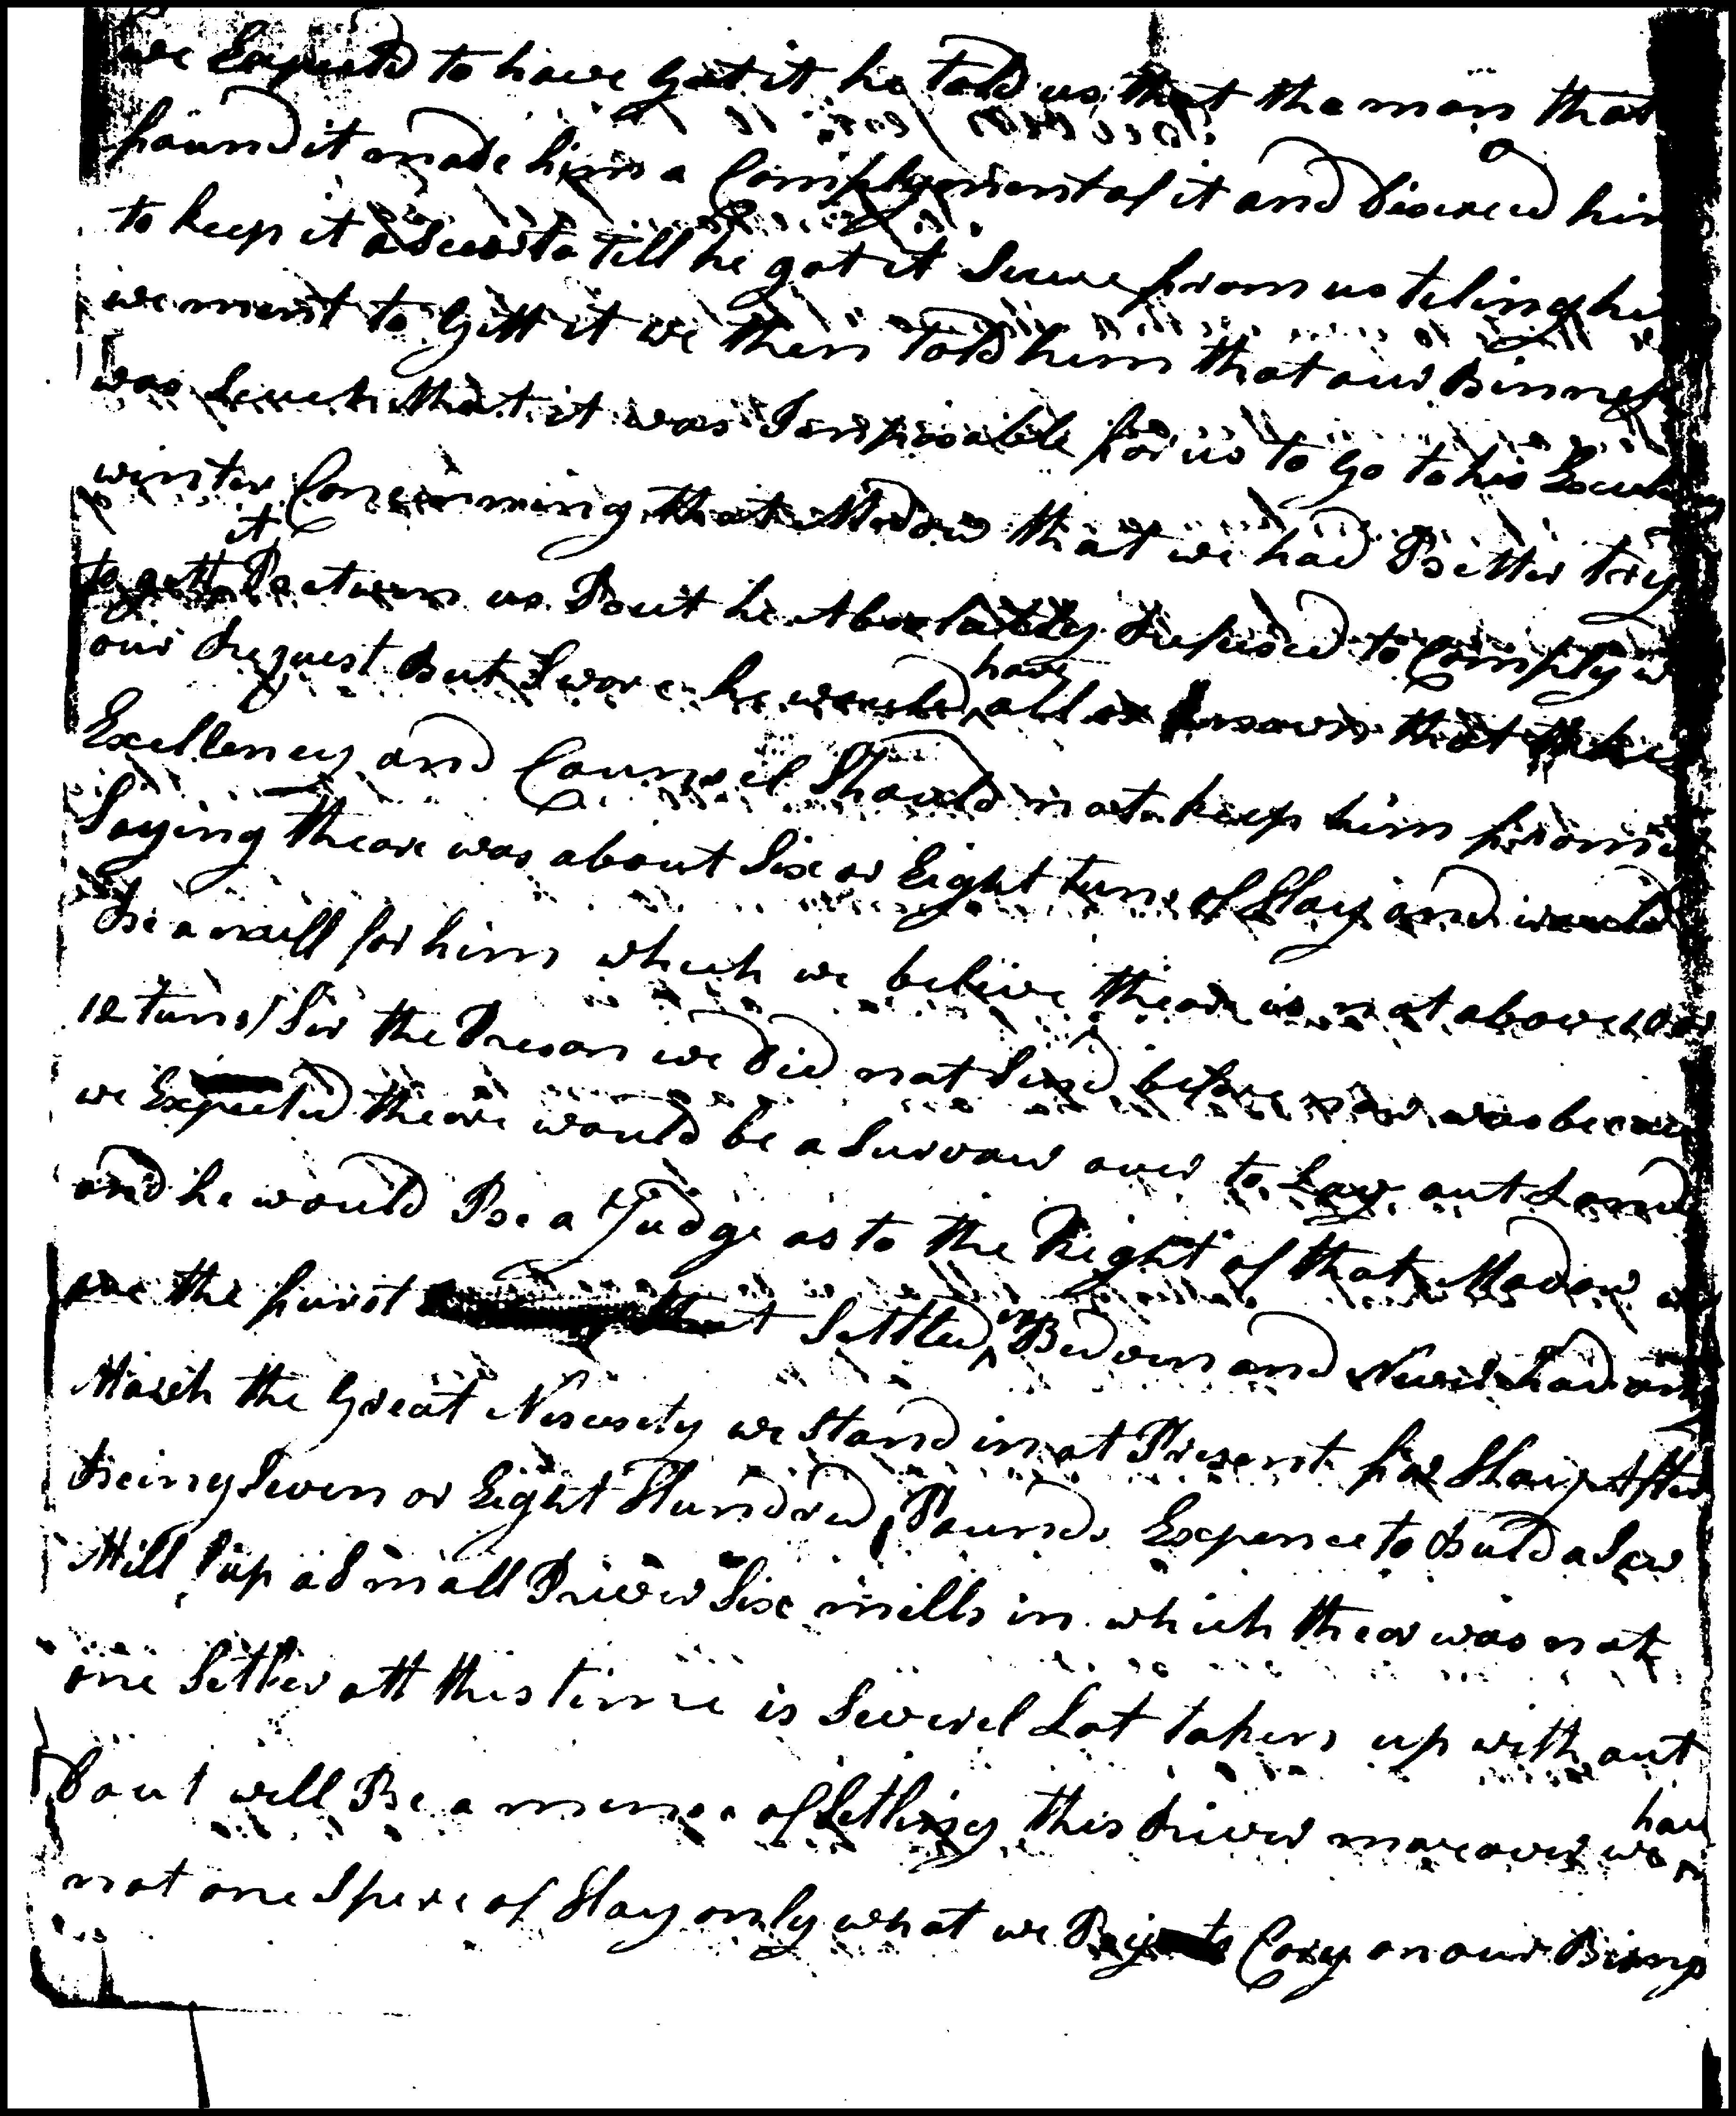 p2.Letter from Benjamin Stymiest III (UEL) and John Bailey